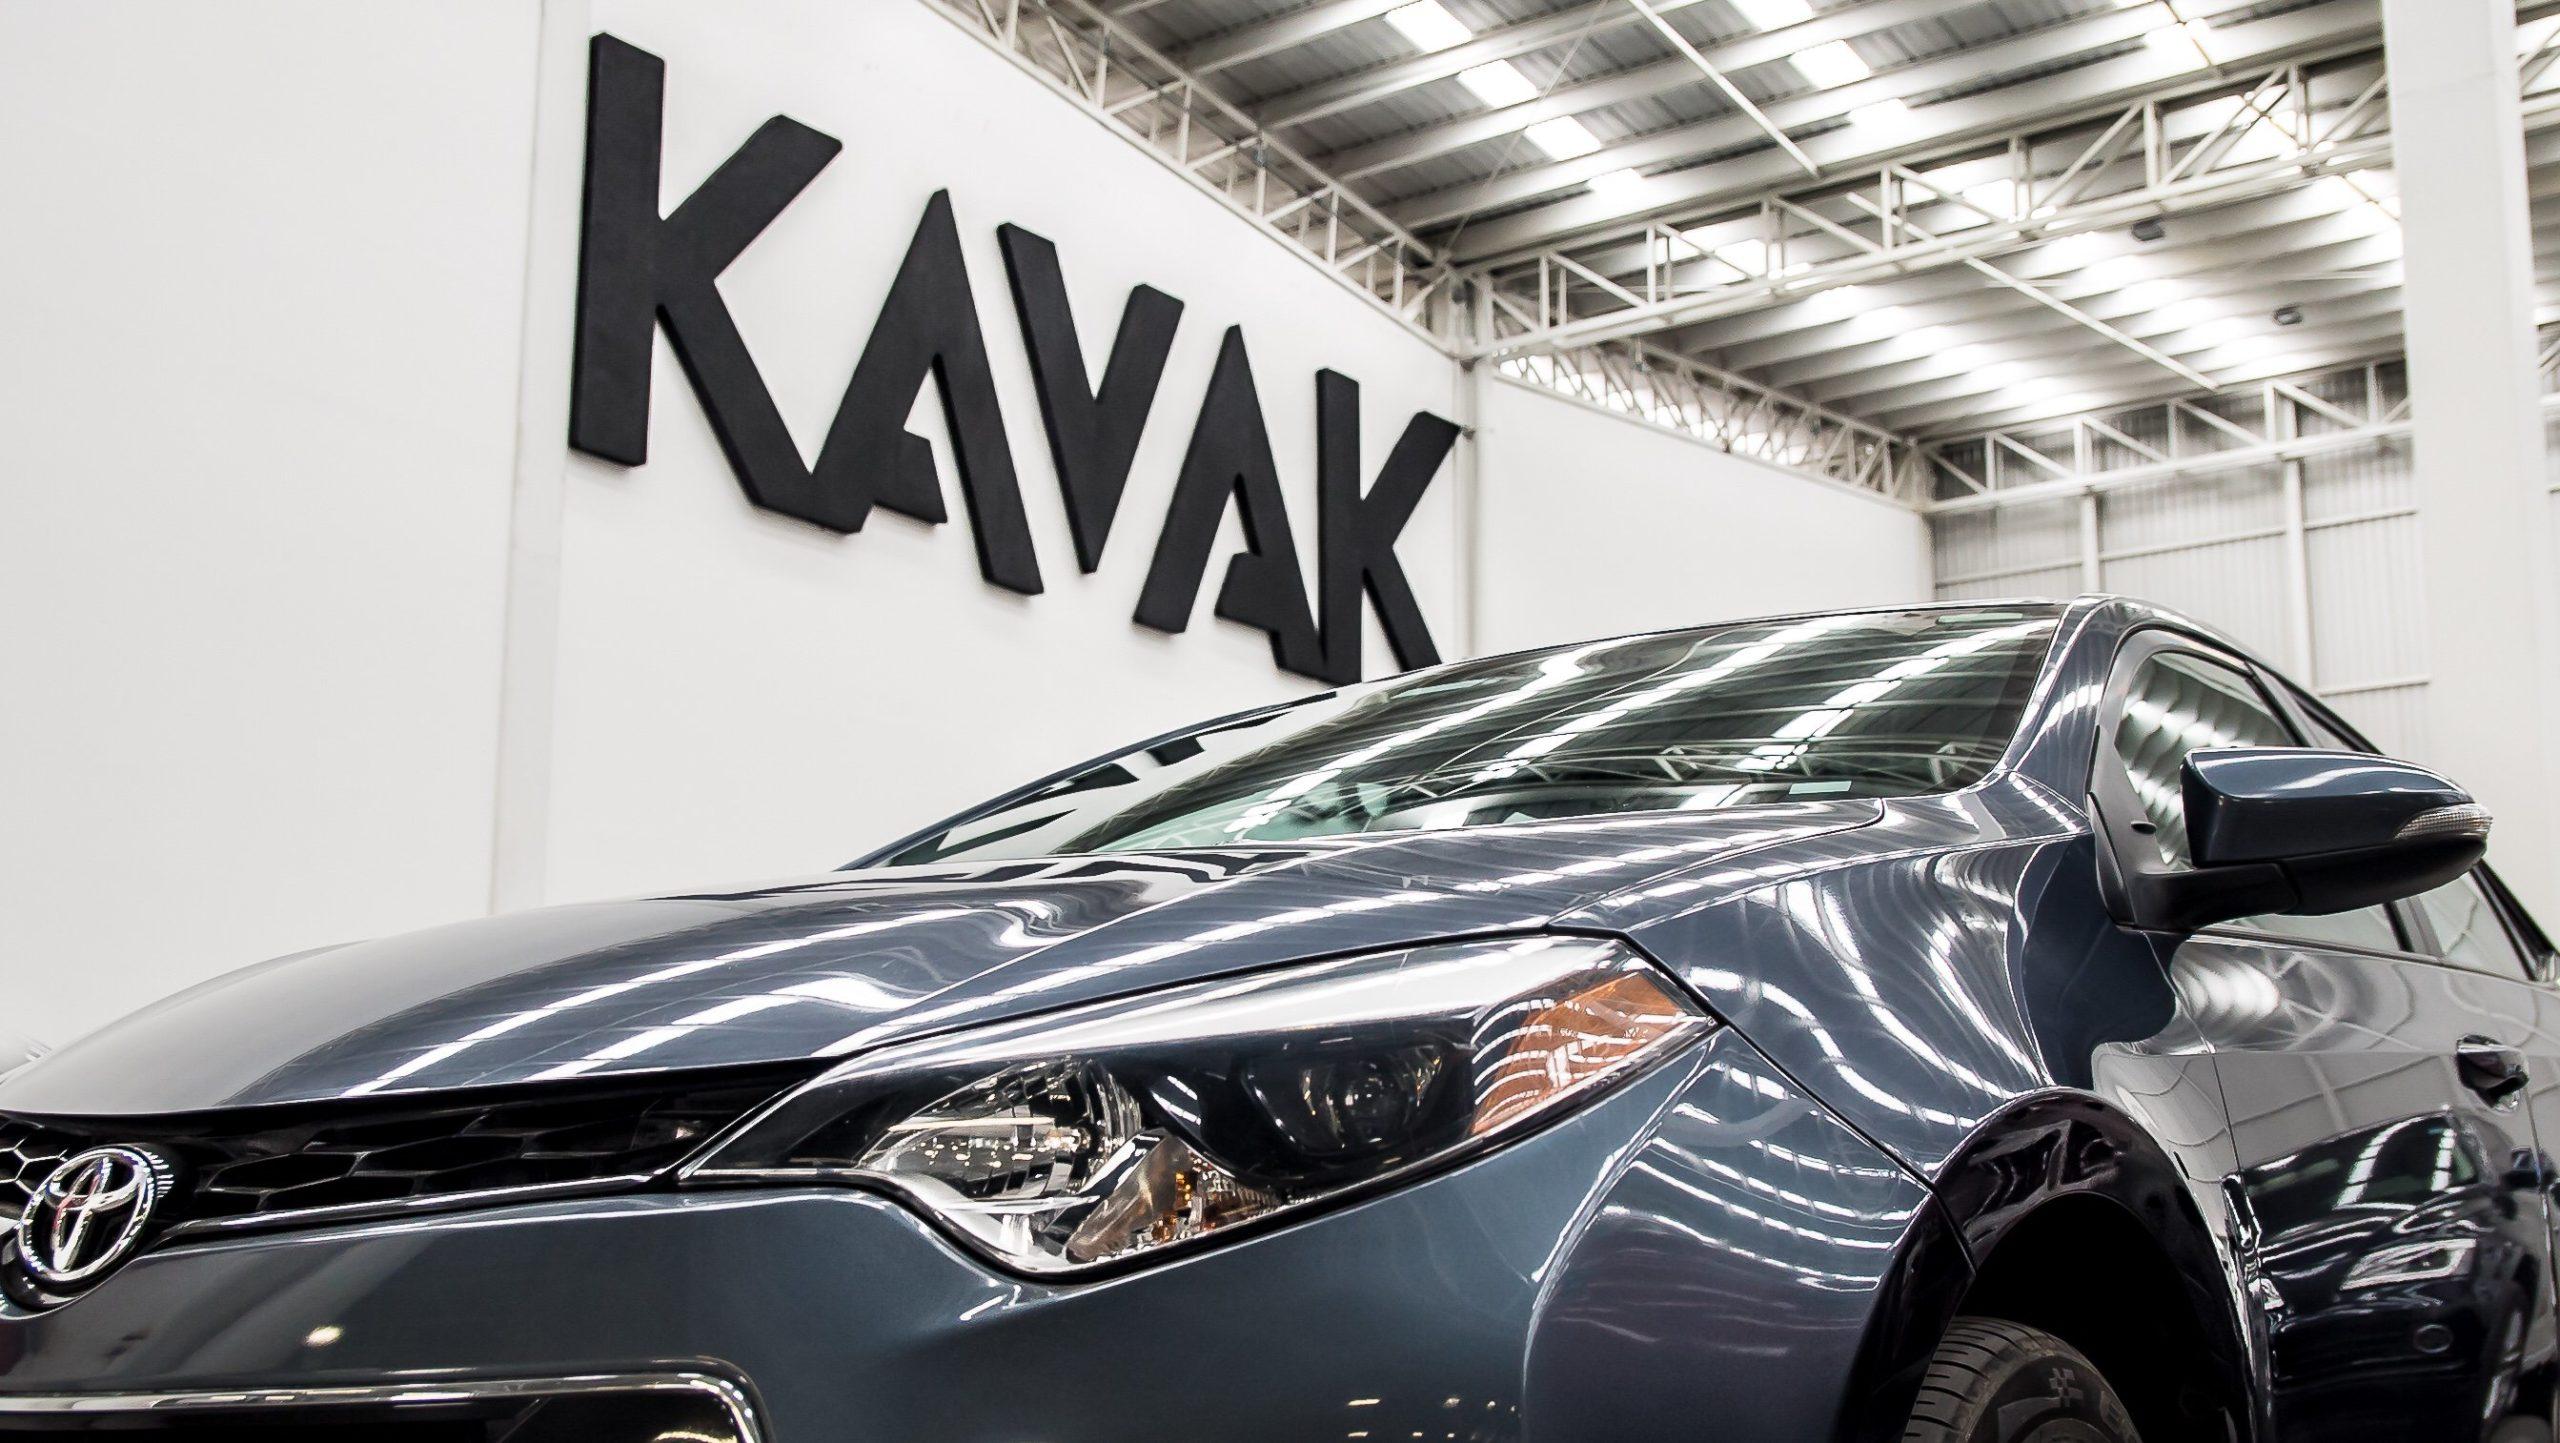 Kavak surge como el primer 'unicornio' mexicano